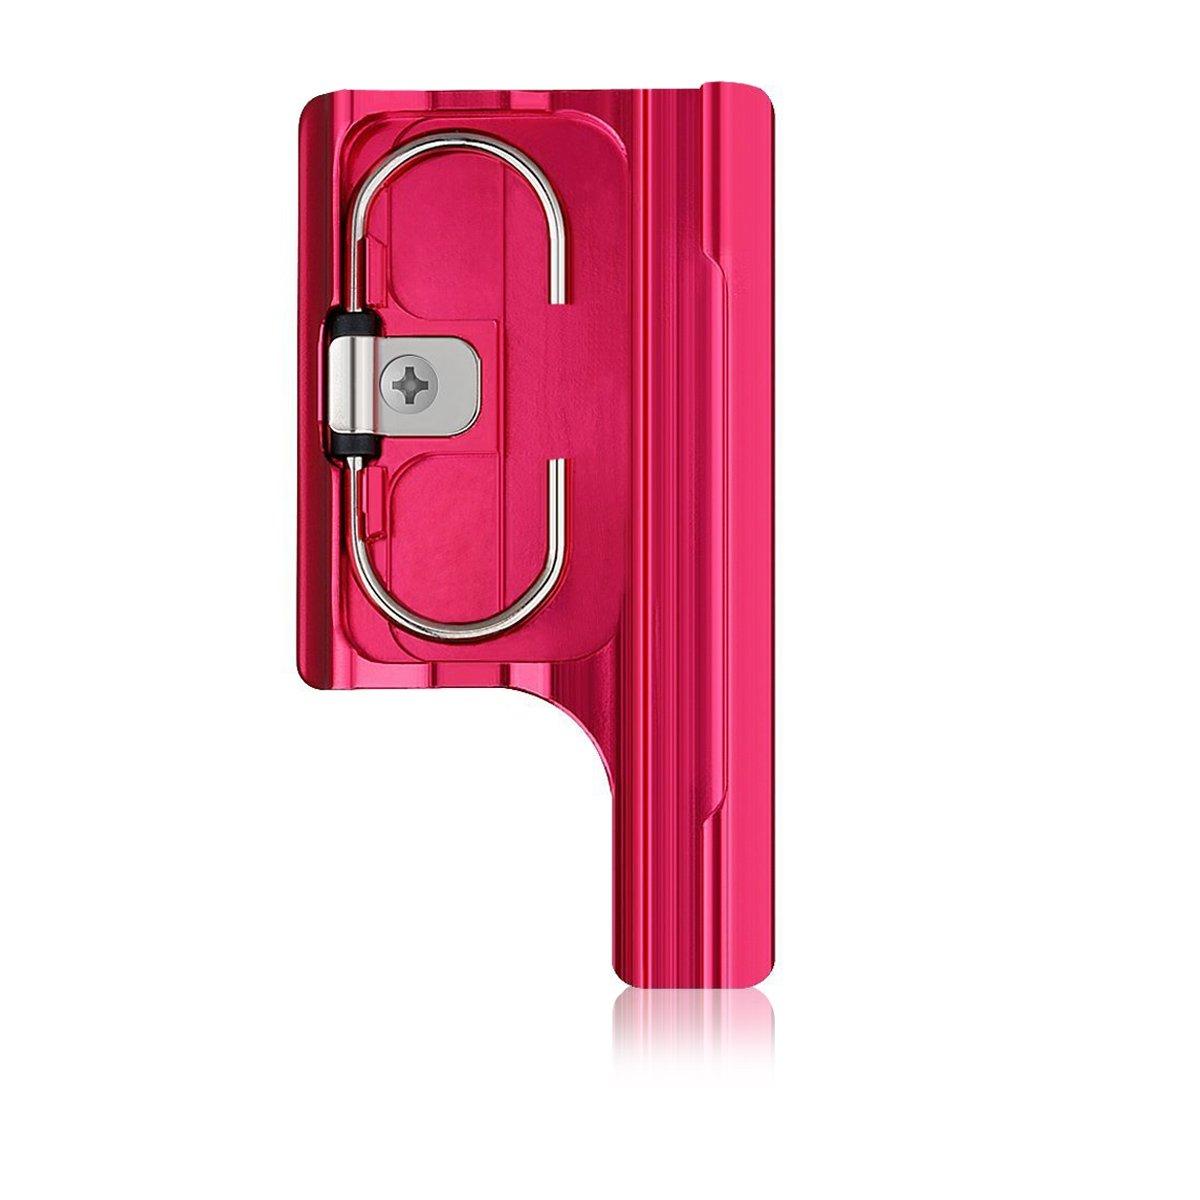 Konsait Aluminum Replacement Rear Snap Latch Standard Waterproof Housing Buckle Lock for GoPro Hero 3+, Hero 3 Plus, Hero 4/Session Camera(Red)